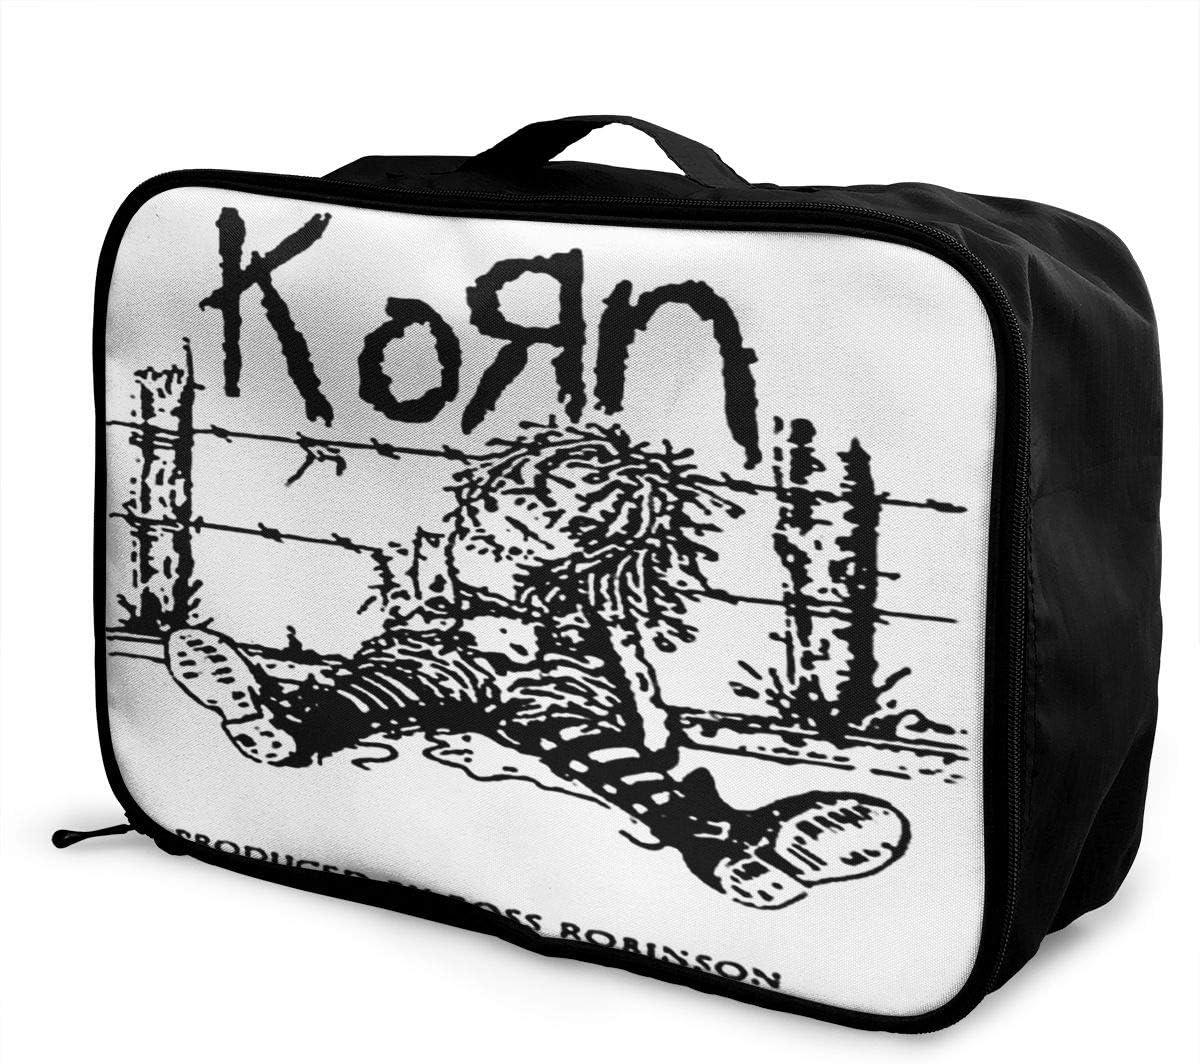 CGWIG Korn Music Band Travel Duffel Bag Waterproof Fashion Lightweight Large Capacity Portable Luggage Bag One Size